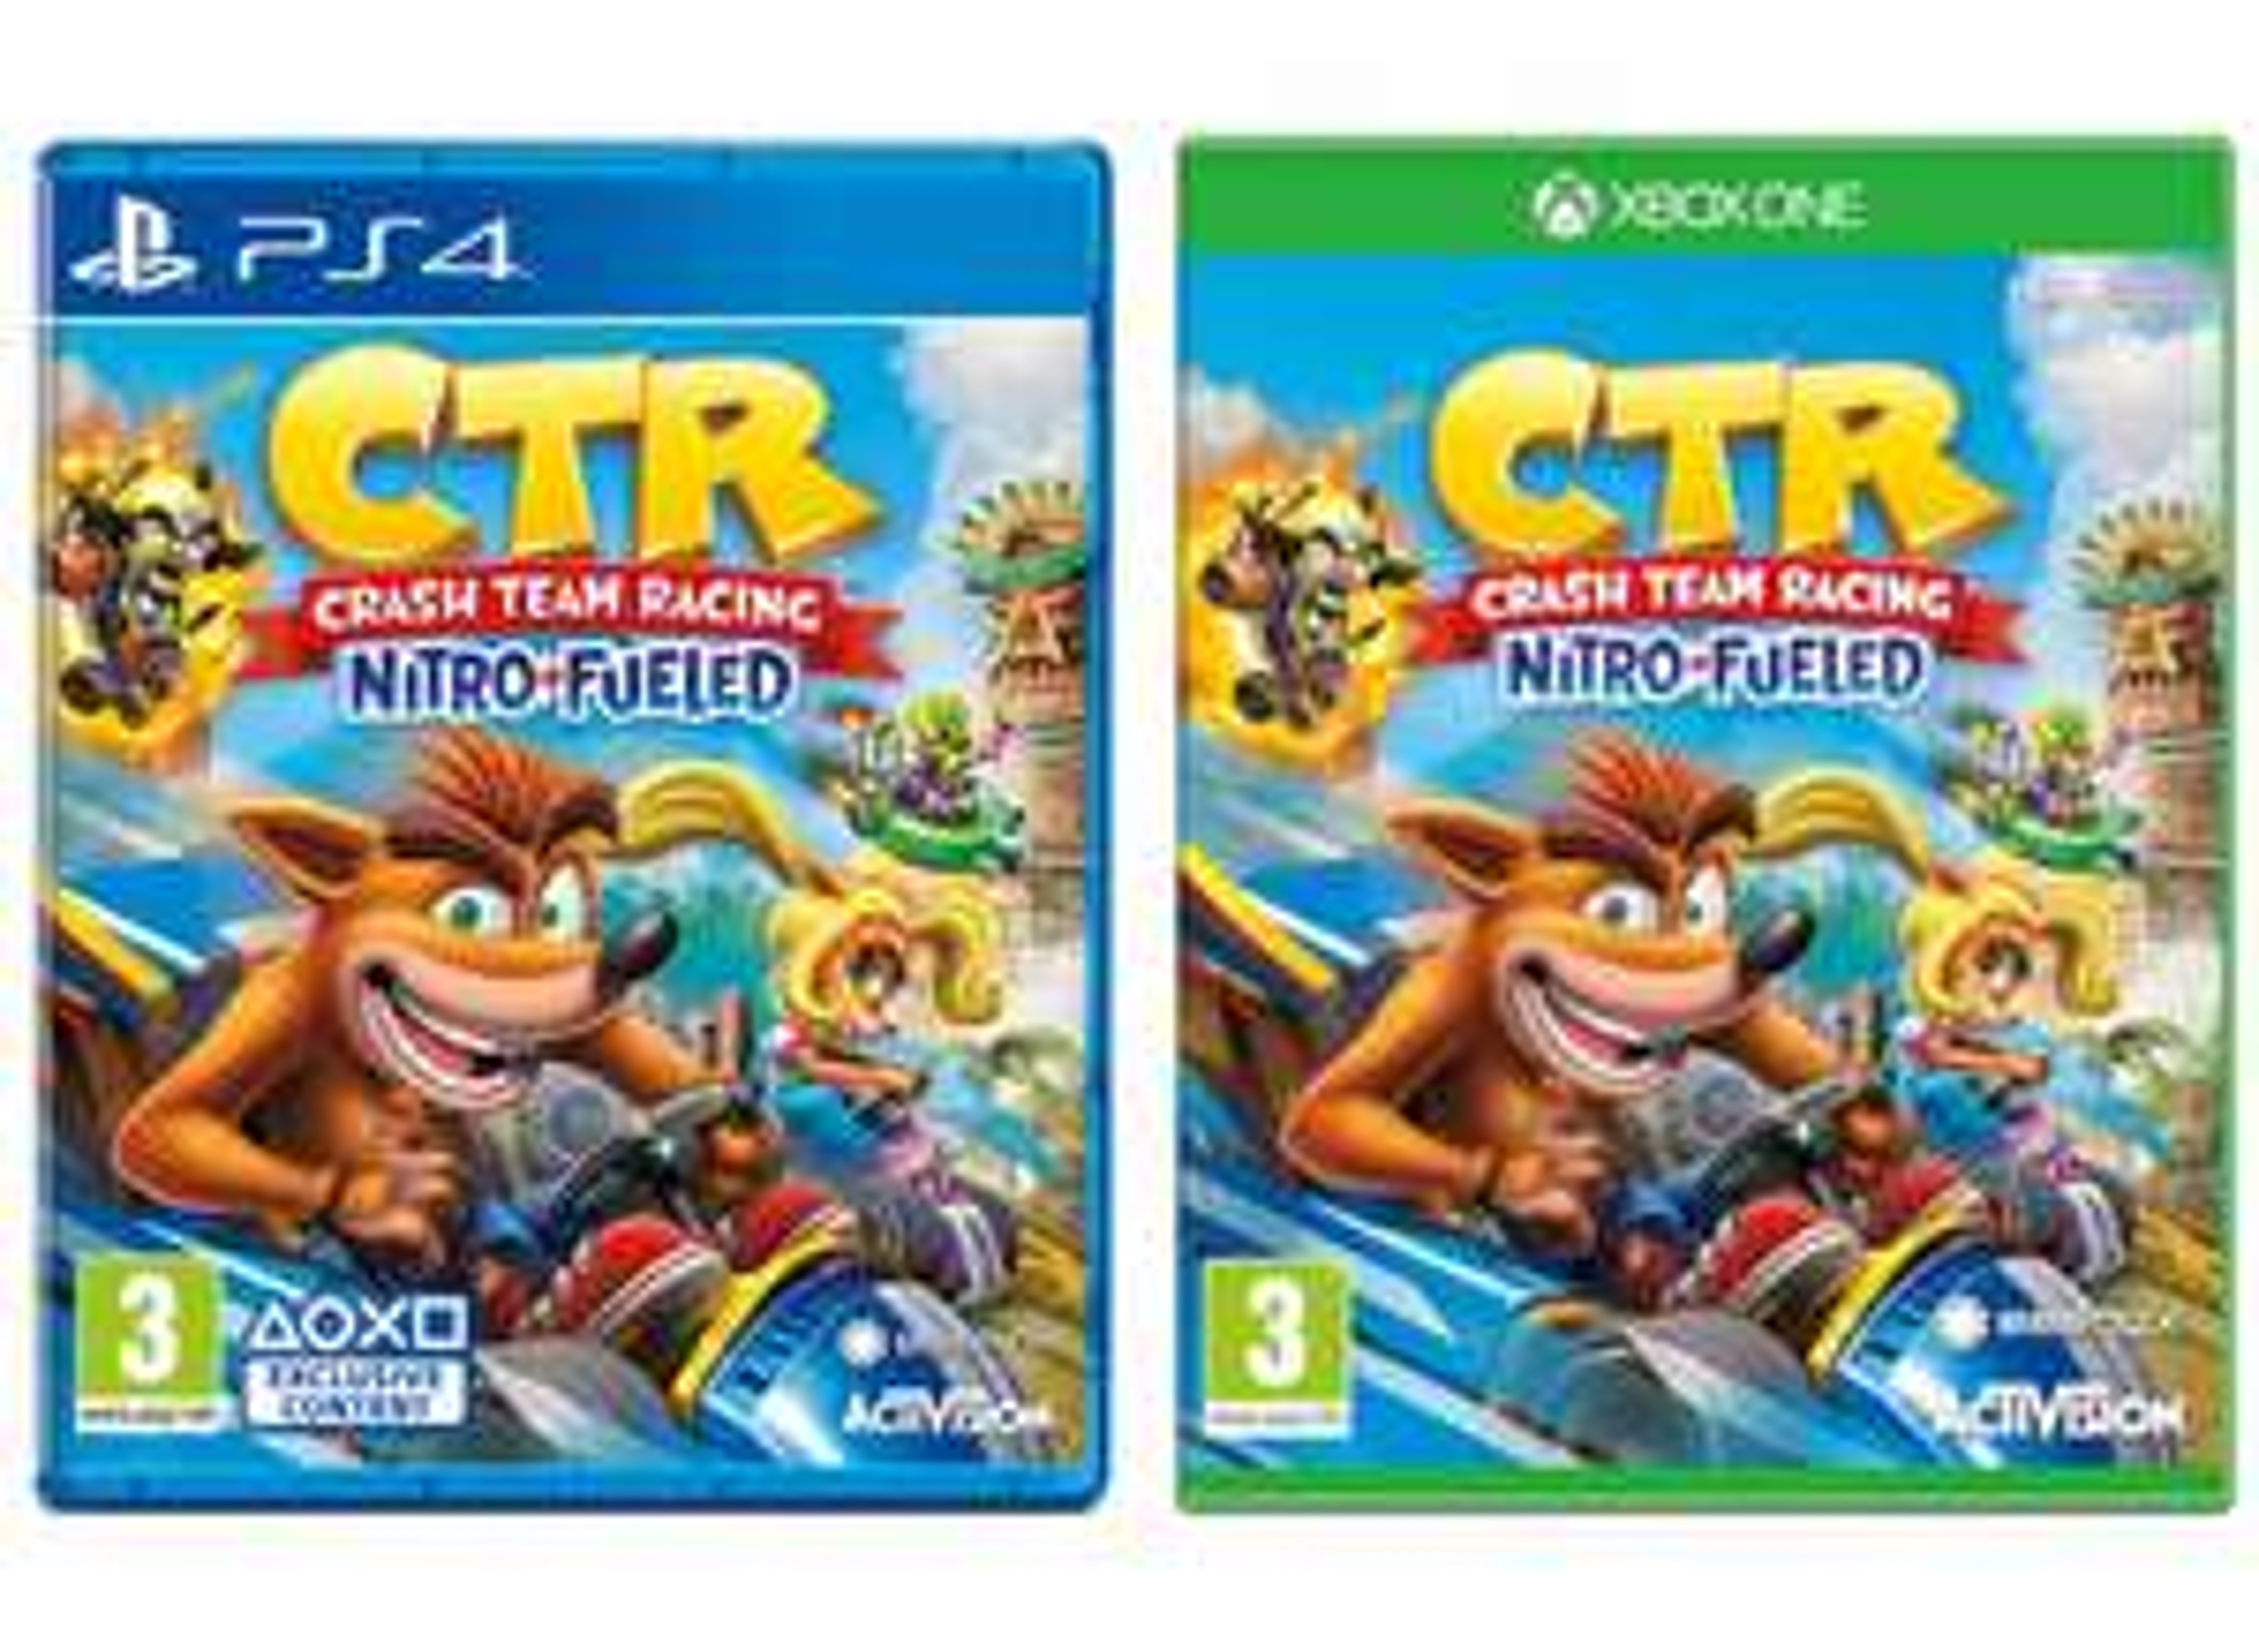 Crash Team Racing Nitro-Fueled (PS4 / Xbox One) for £22.99 @ Argos